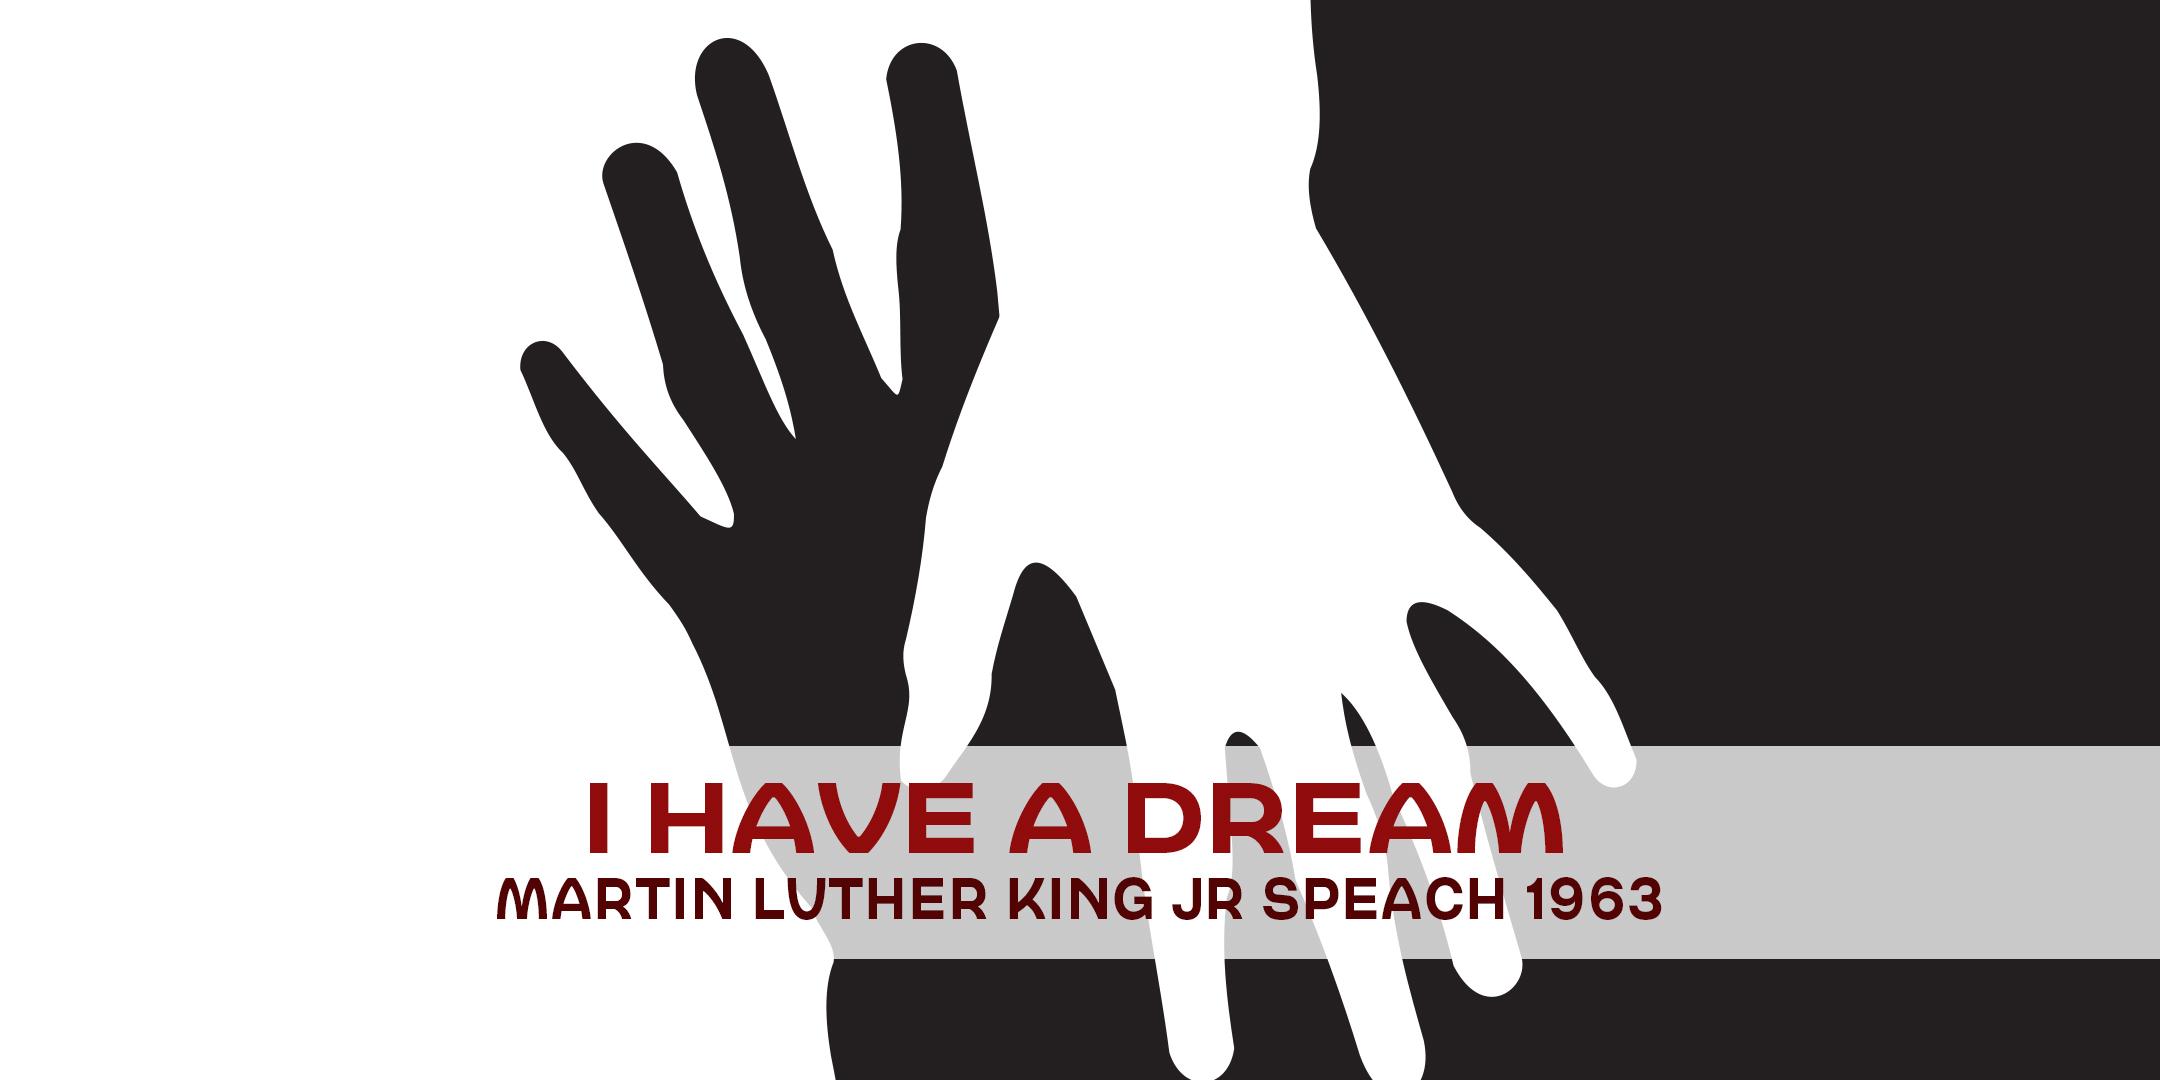 mlk-jr-dream